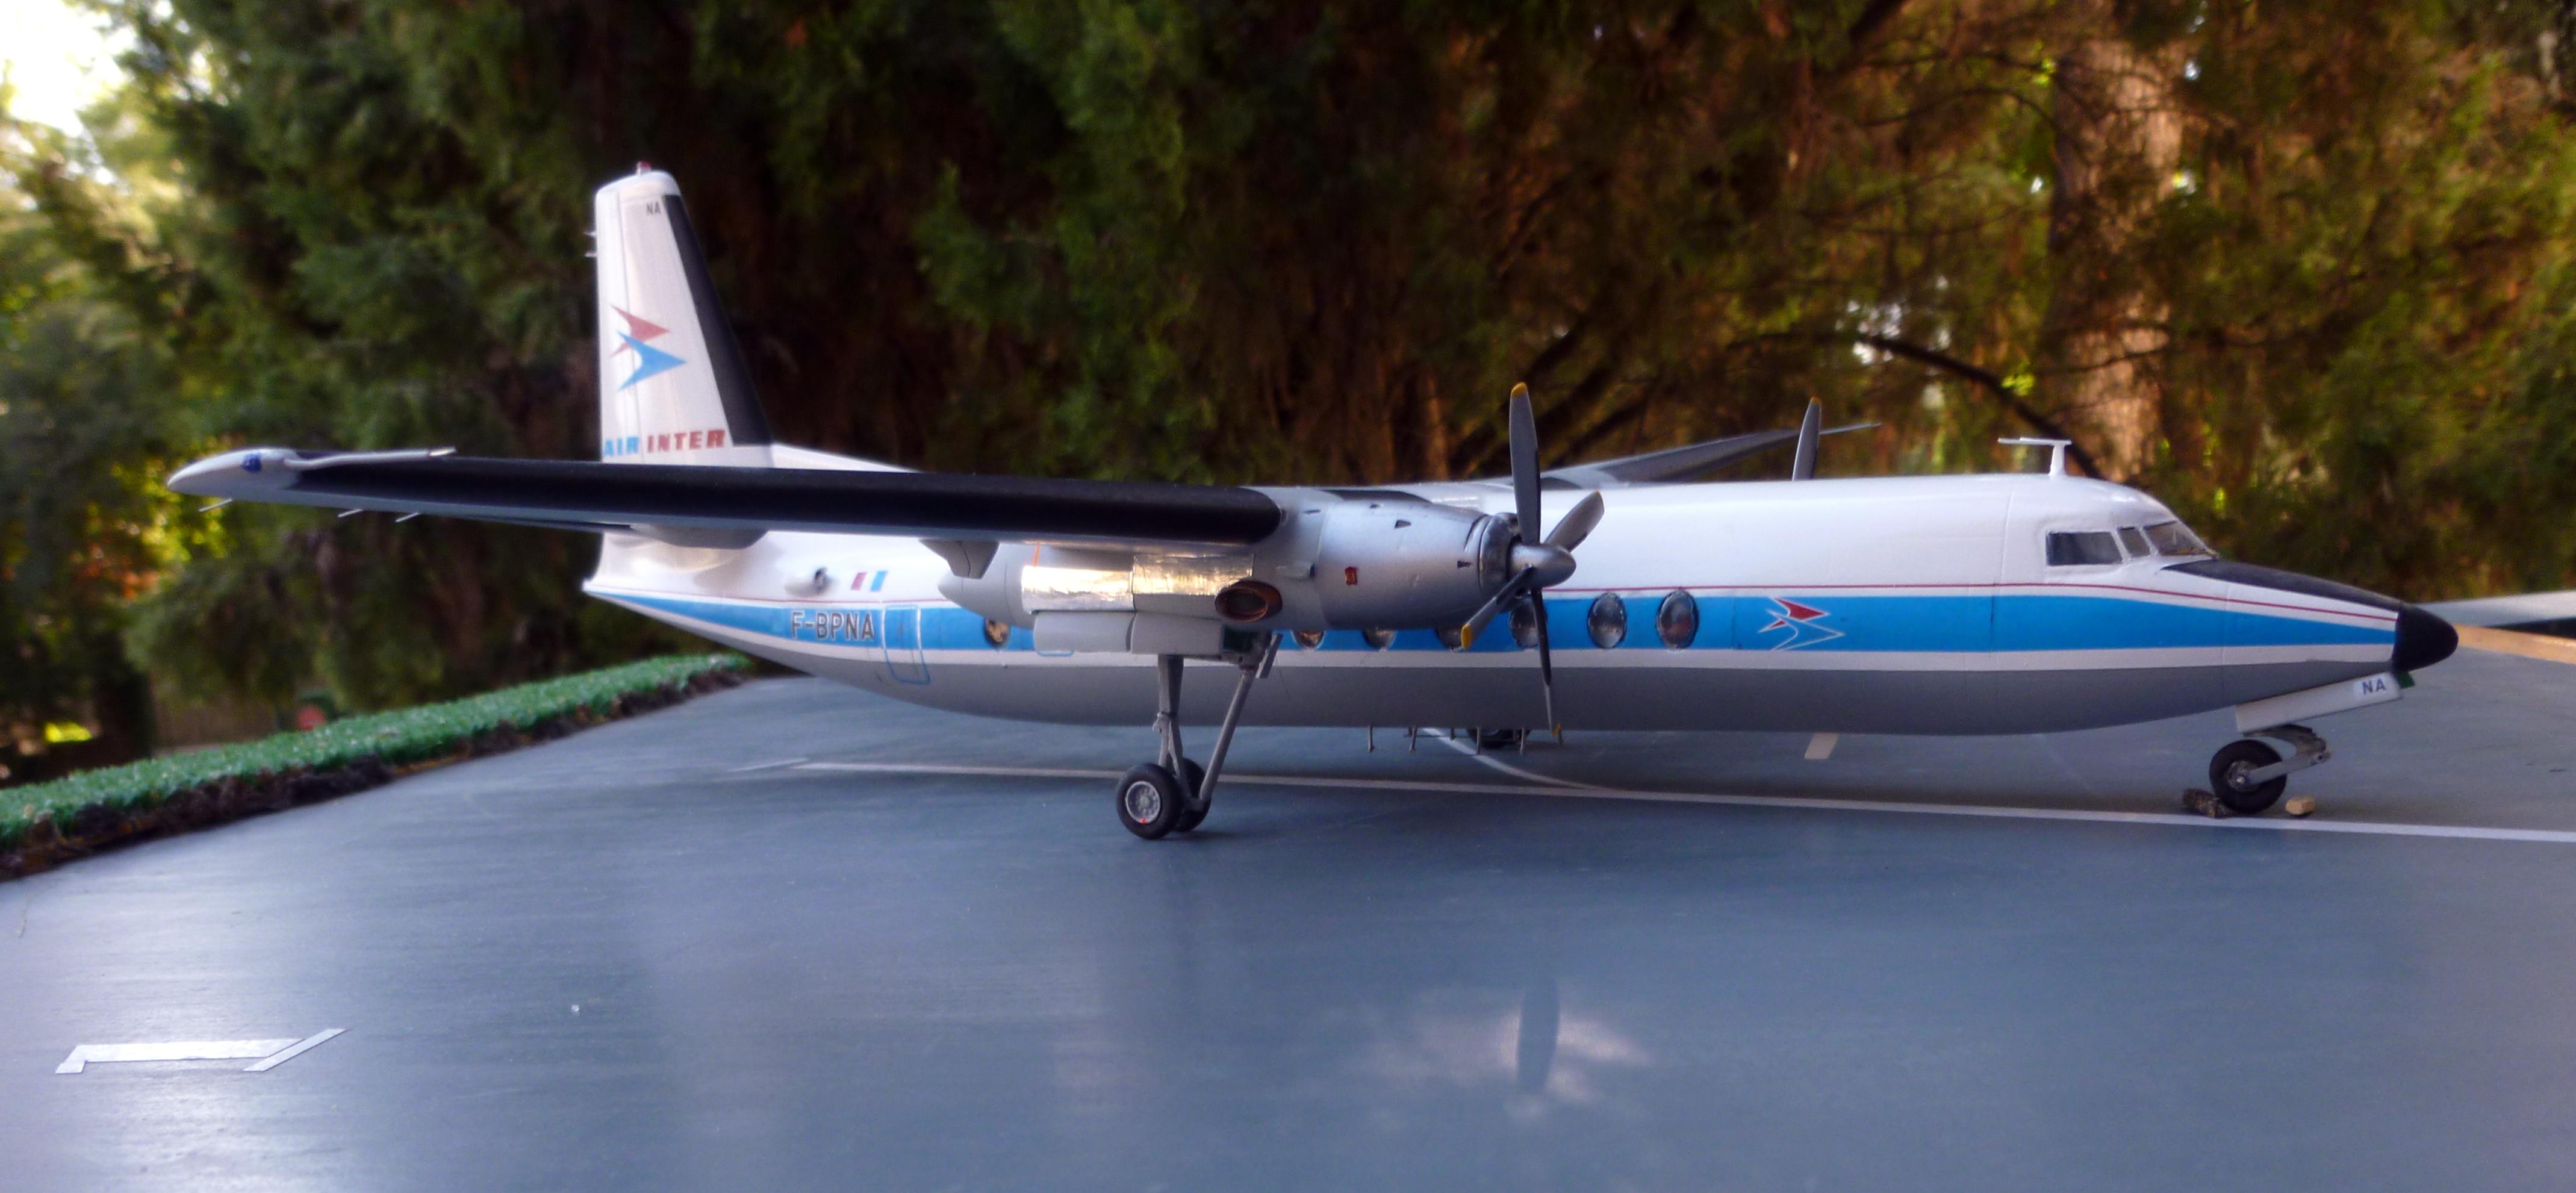 Fokker F 27-500  ESCI 1/72 scale - Page 2 18091105574621371115887937